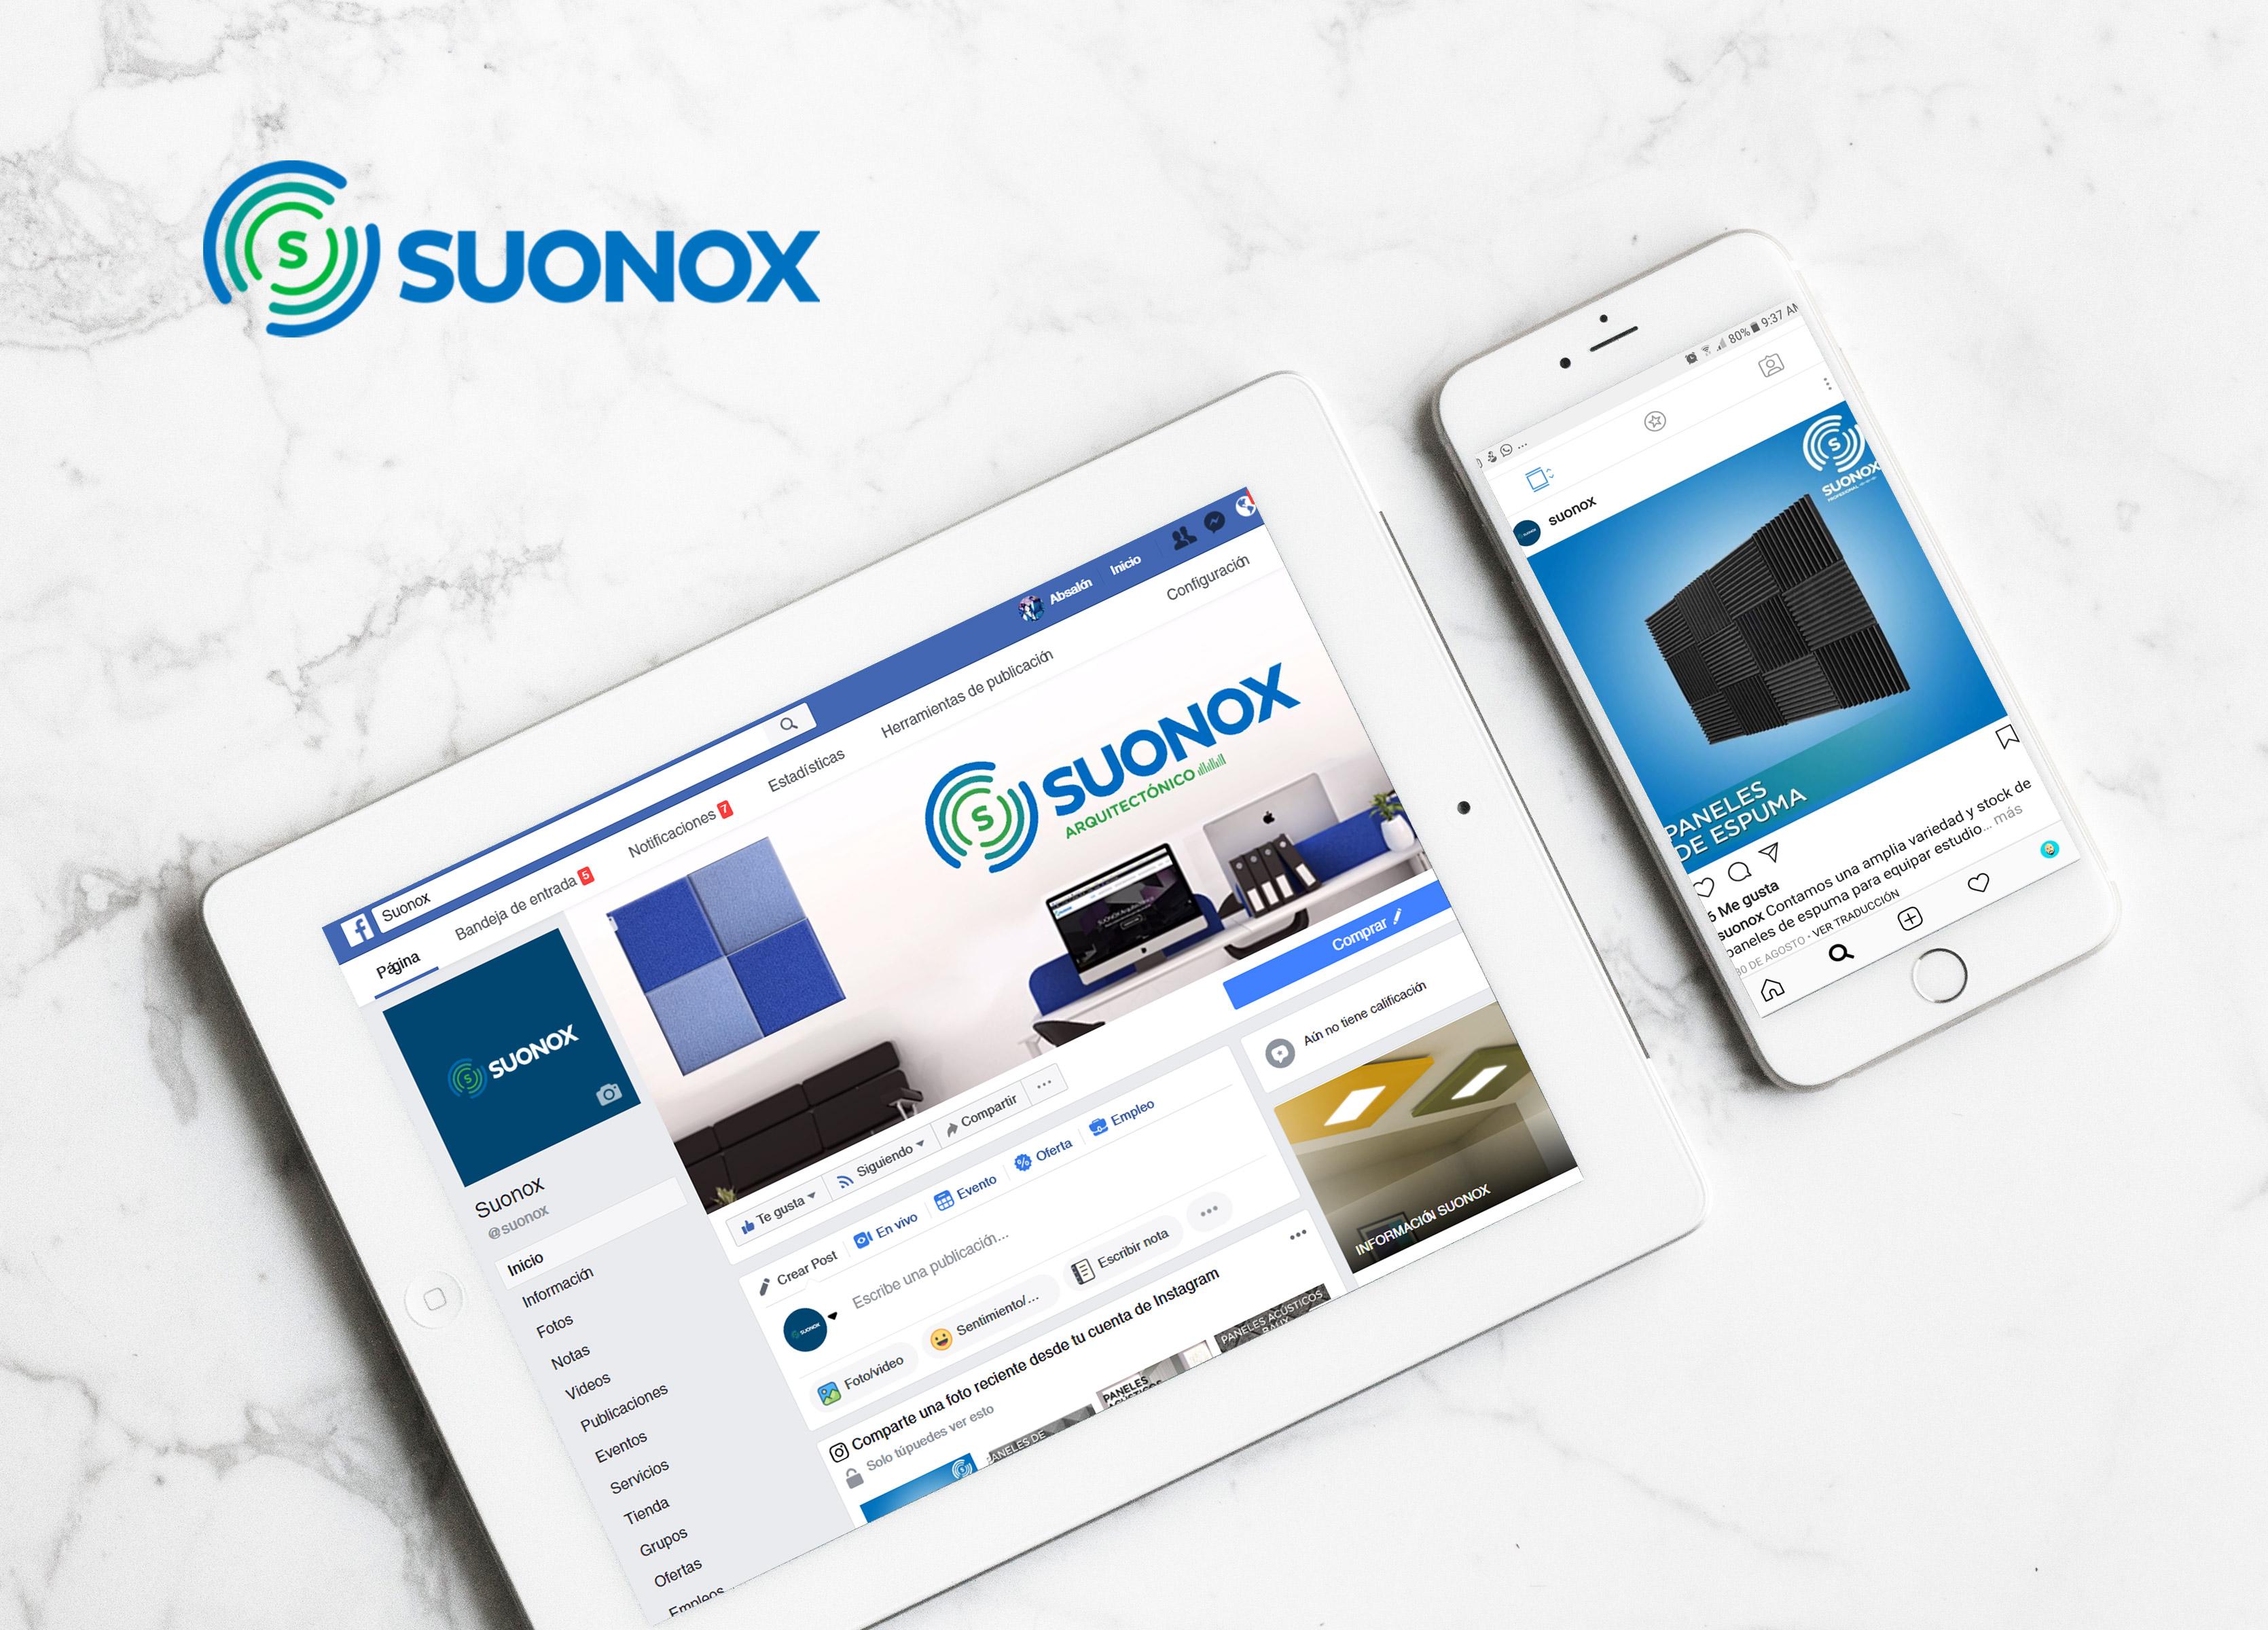 Suonox Strategia 2.0